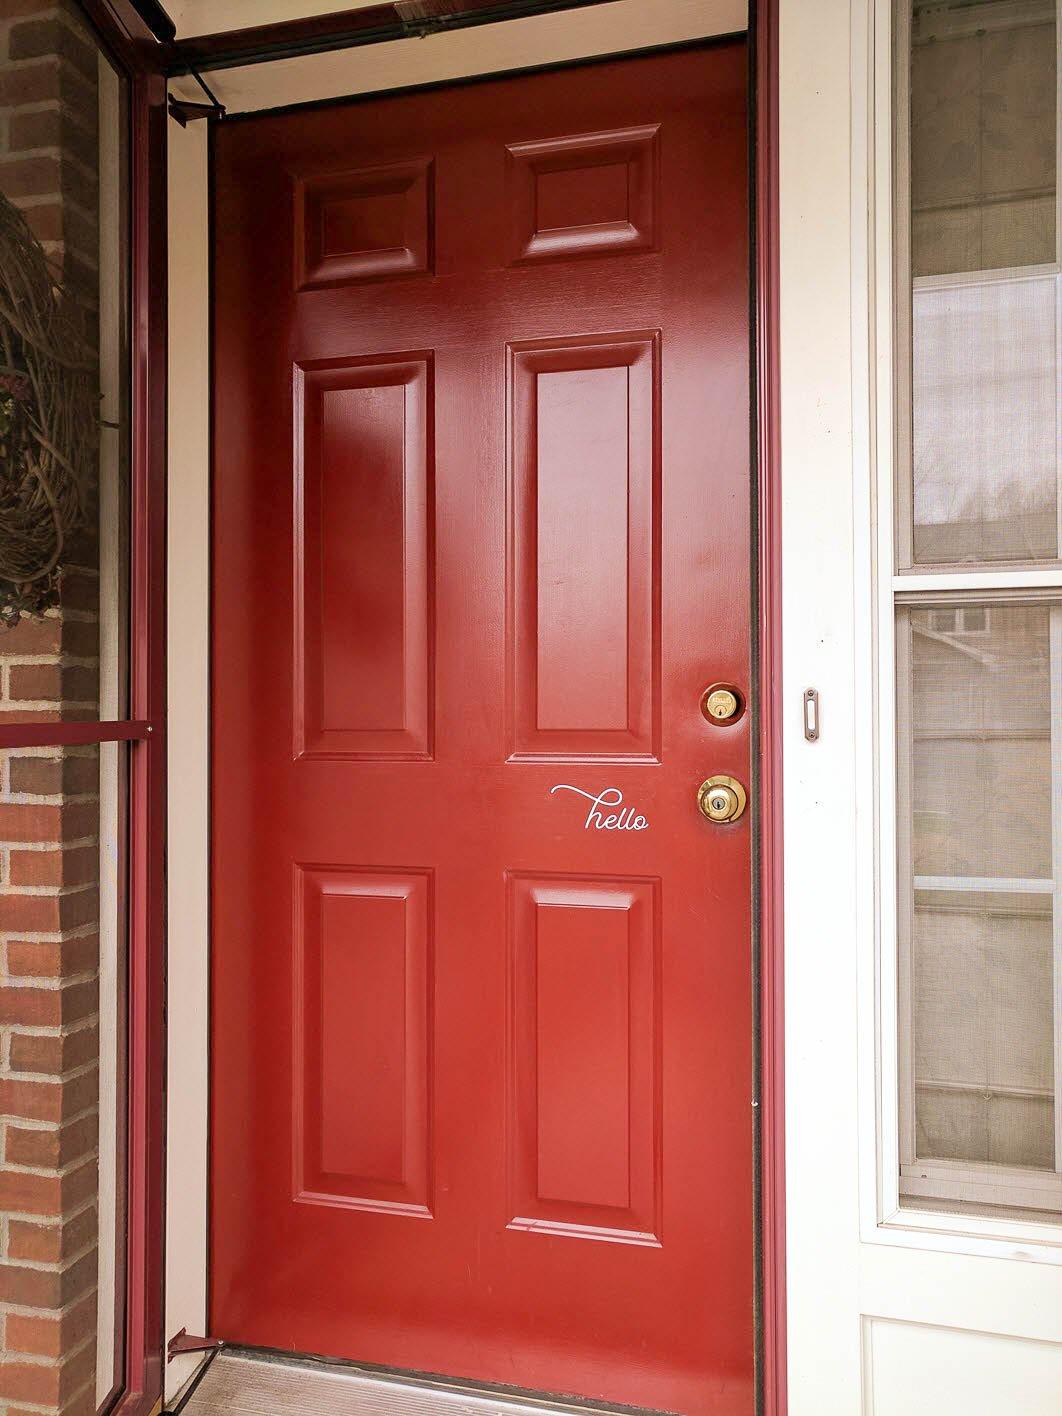 How to easily clean your front door back to new again for 13 door